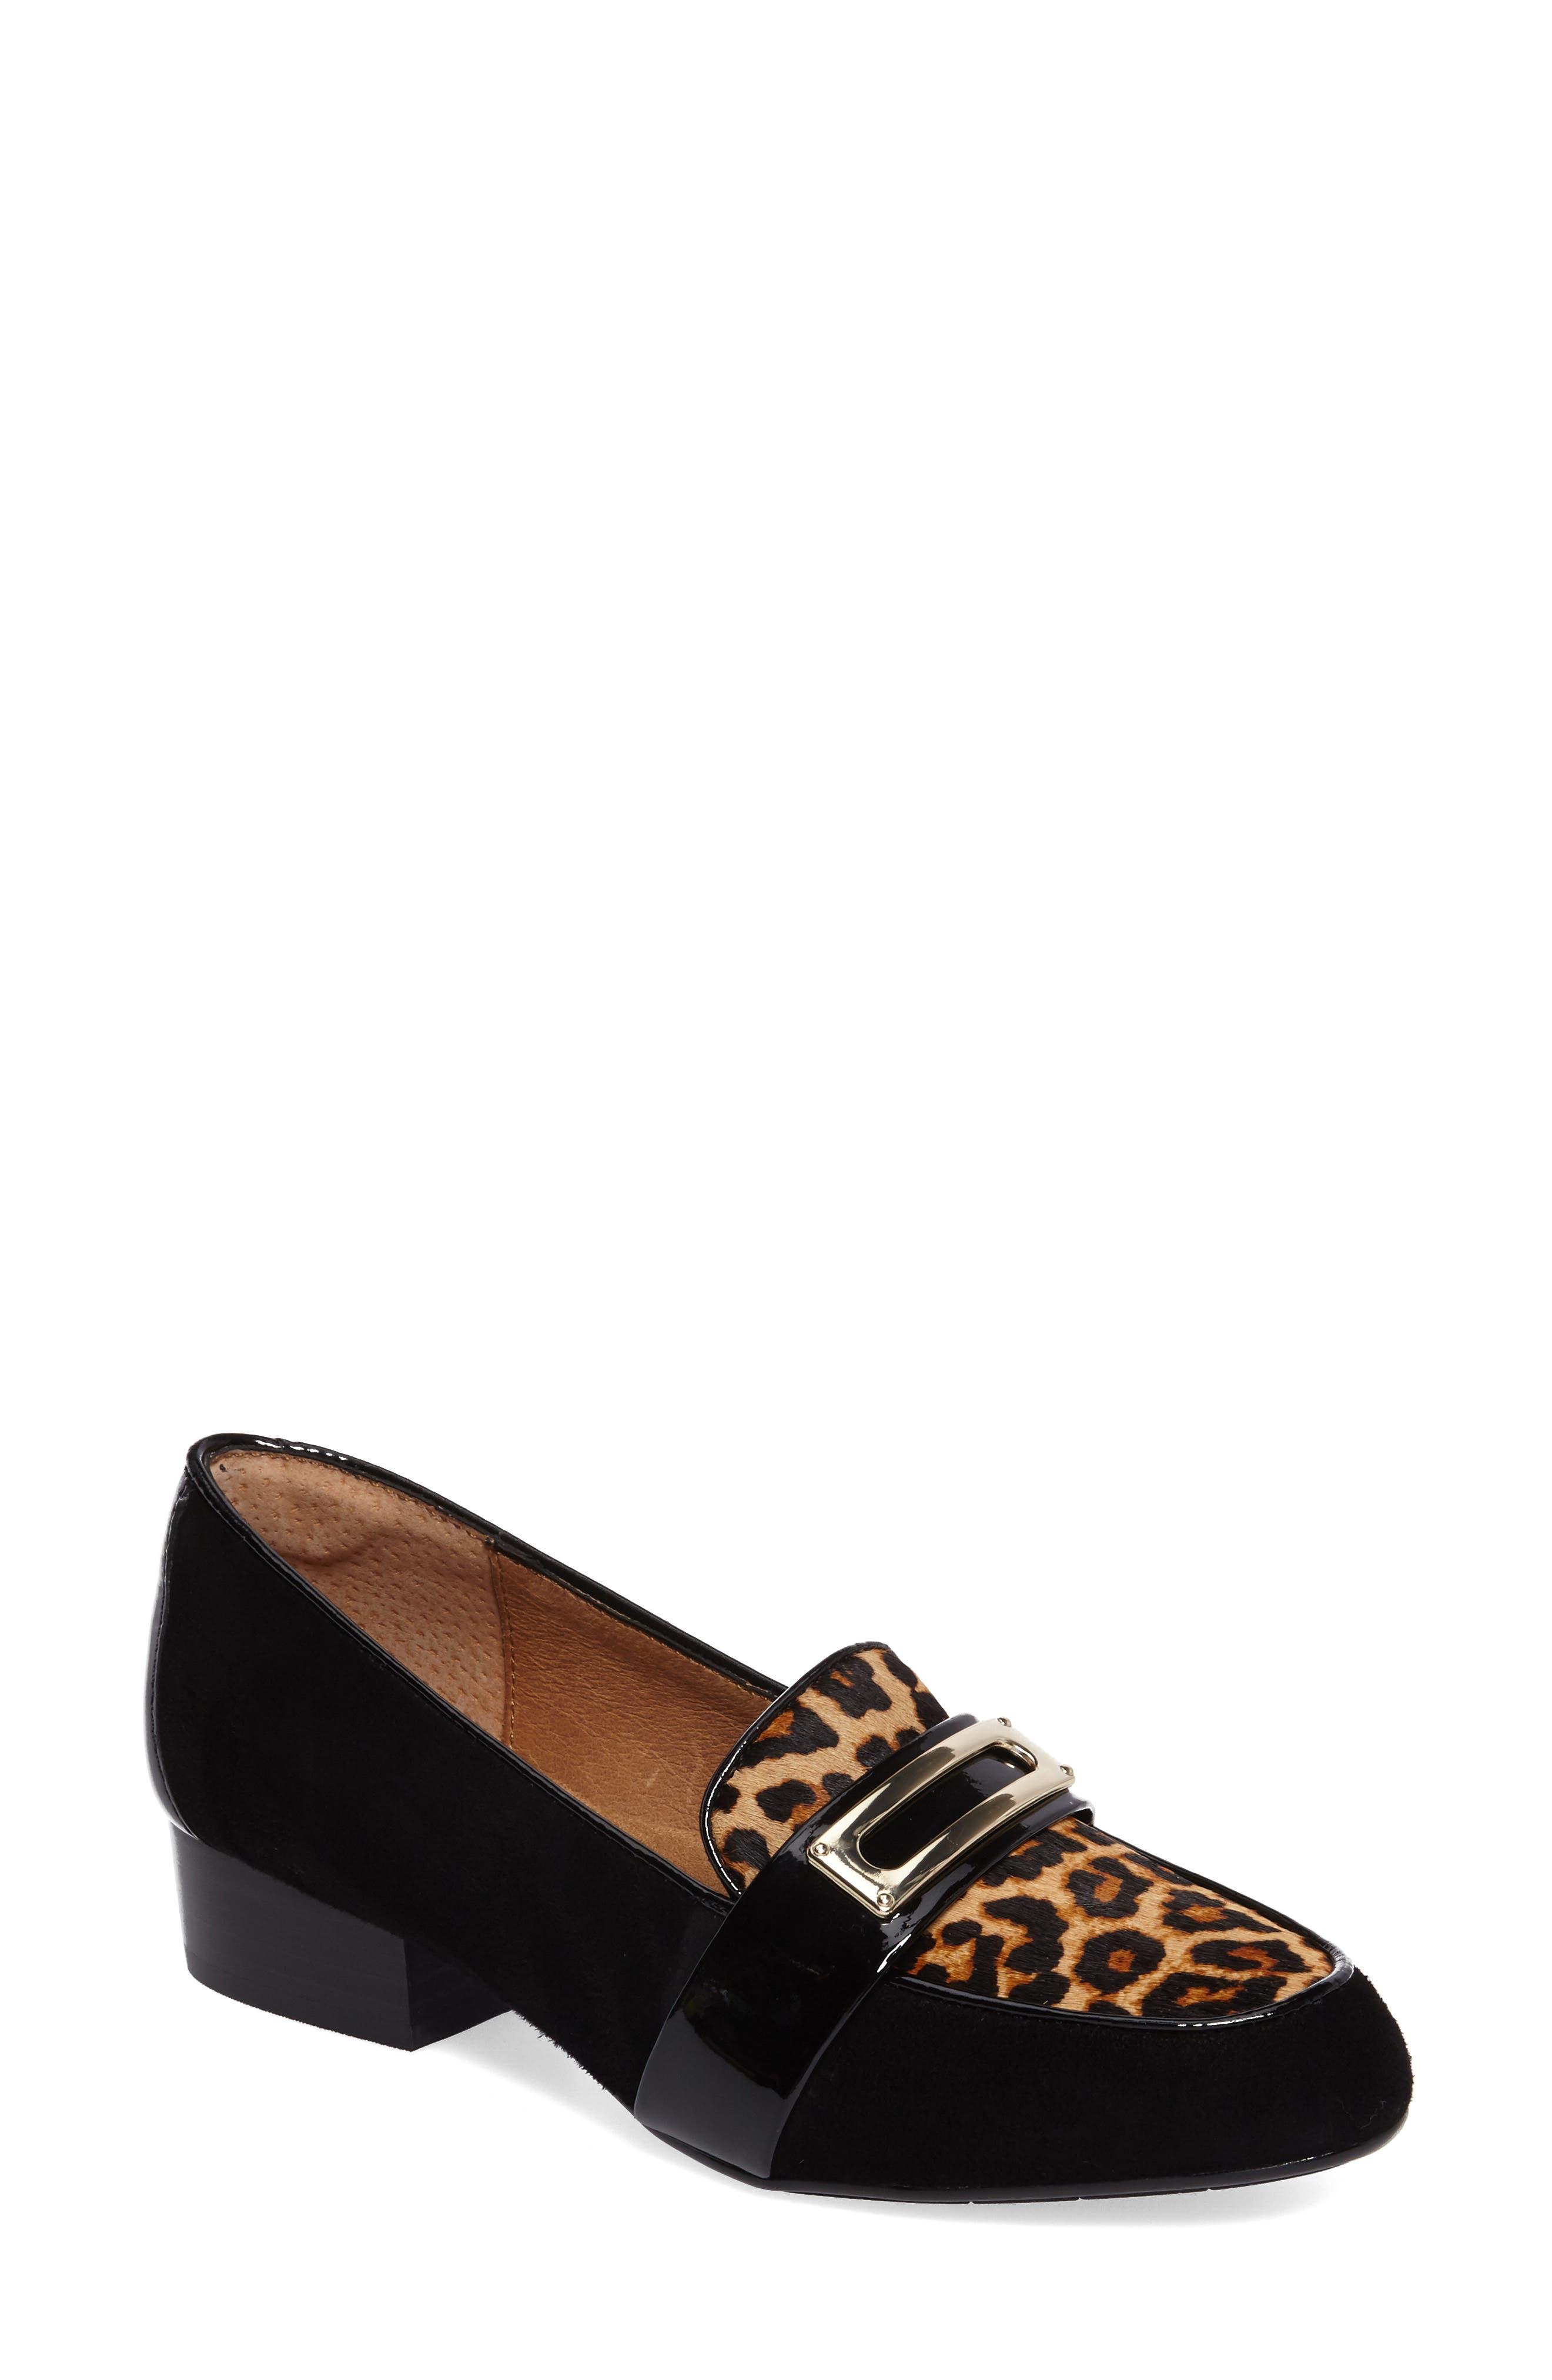 Main Image - Söfft Brandis Genuine Calf Hair Loafer (Women)